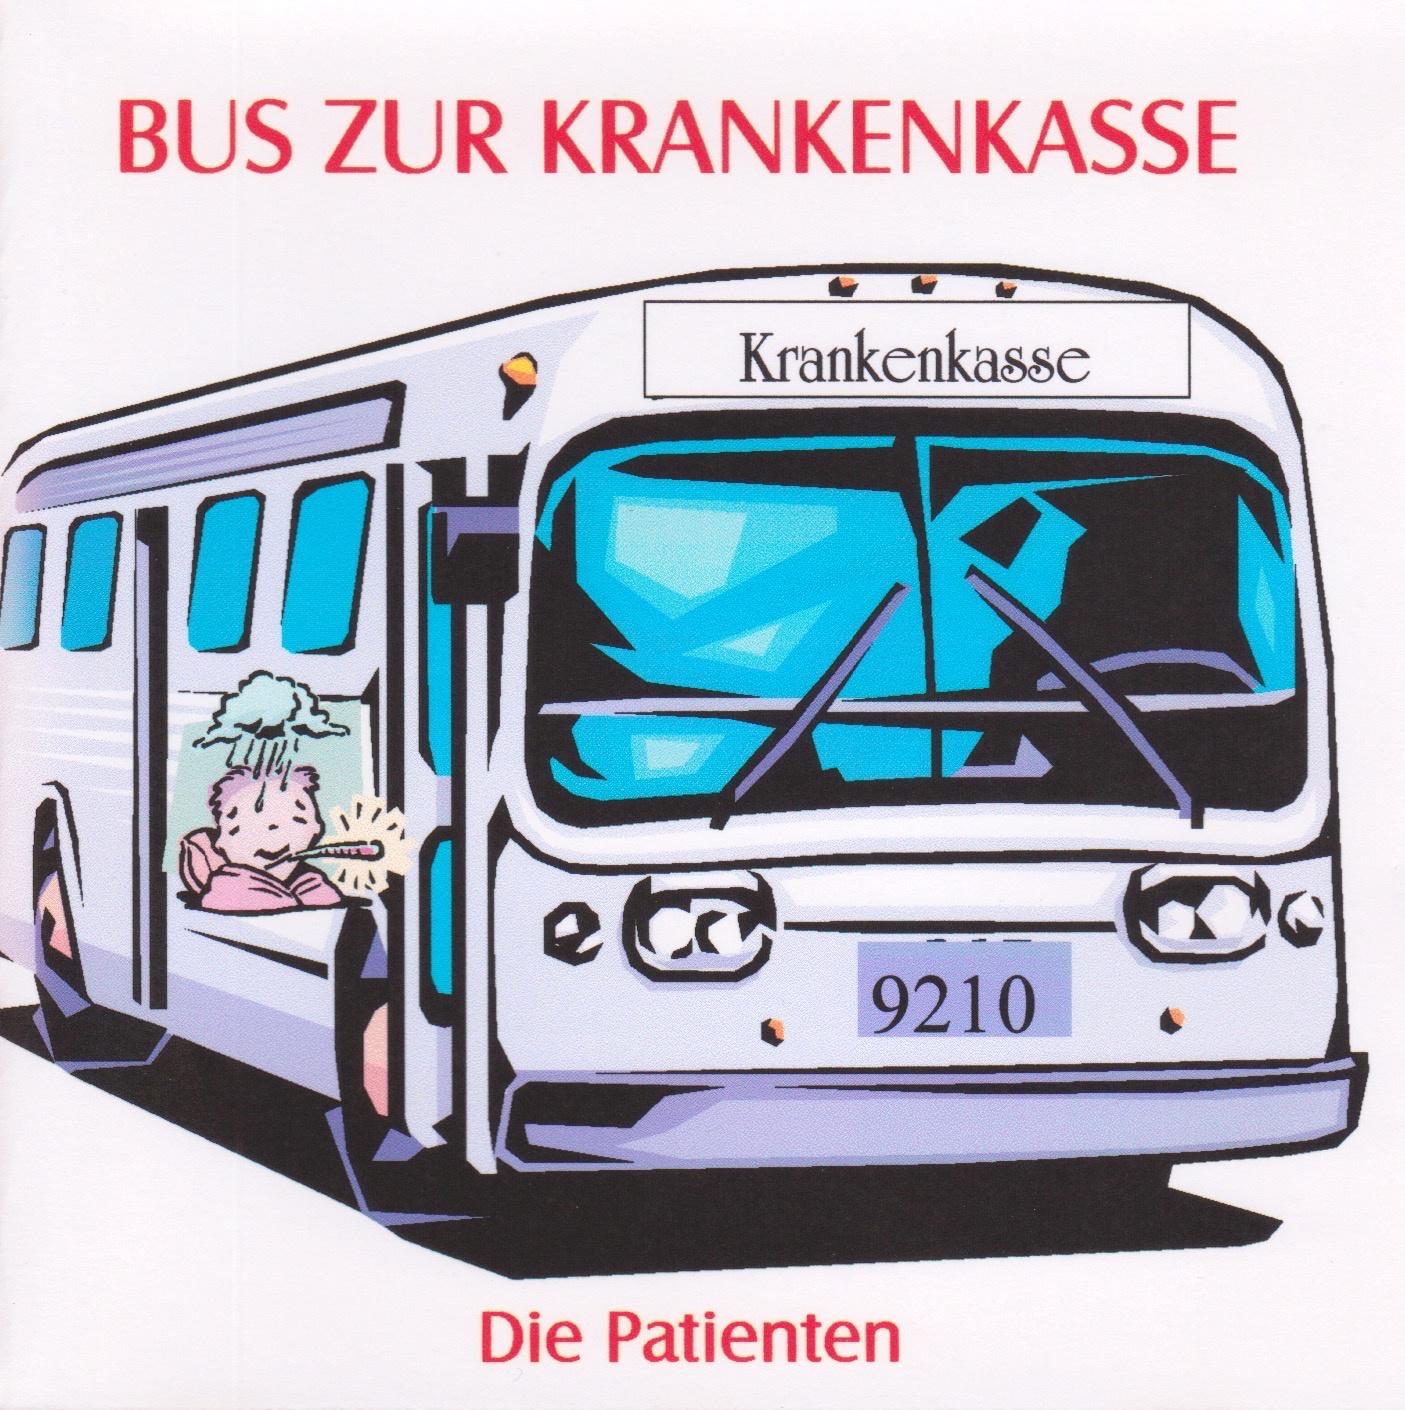 https://0501.nccdn.net/4_2/000/000/038/2d3/Bus-zur-Krankenkasse-1405x1410.jpg